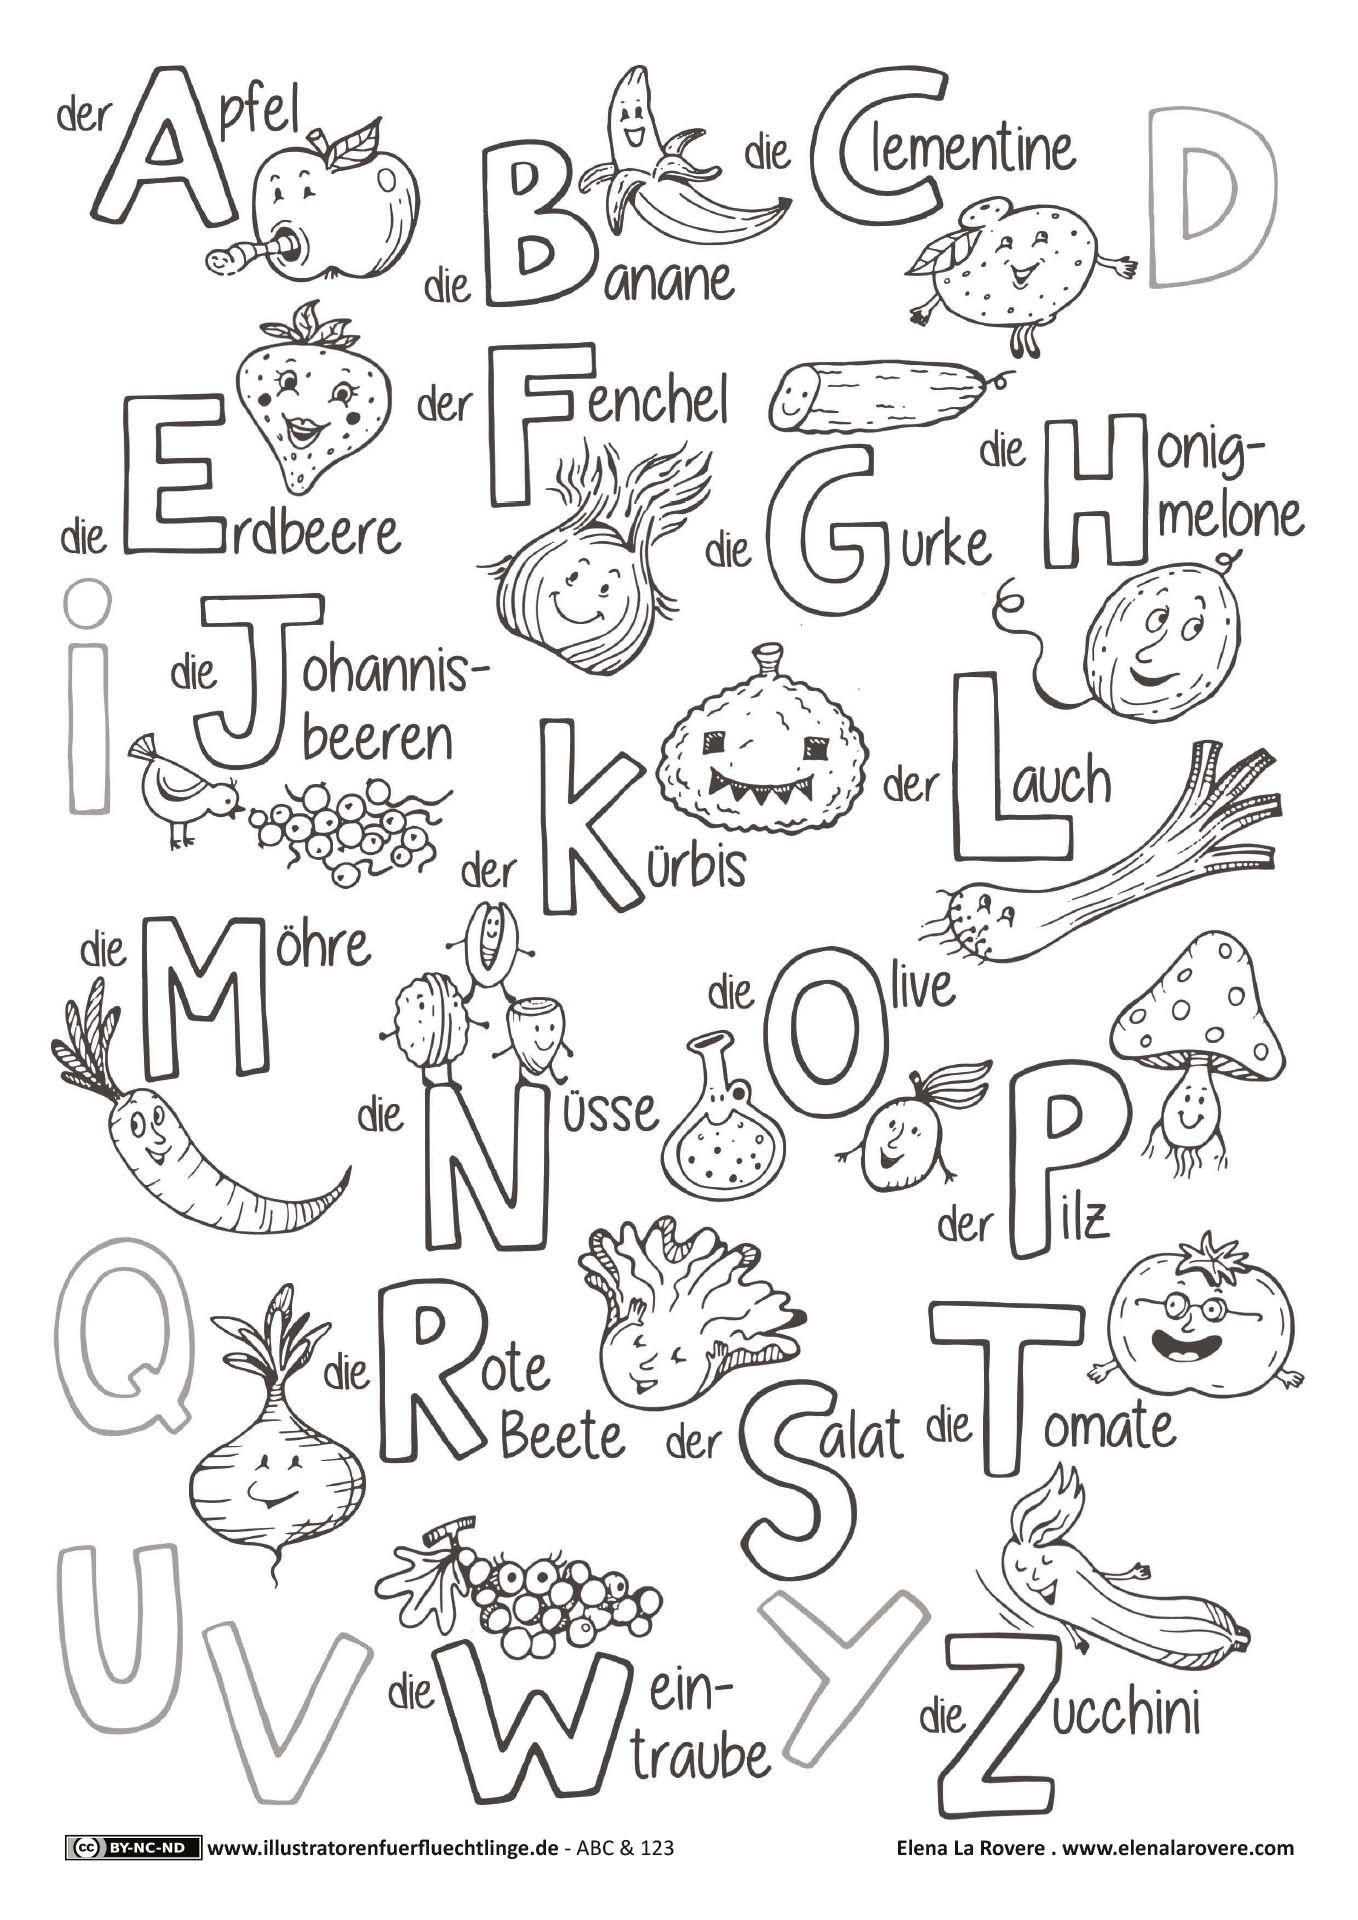 ABC und 123 - Obst und Gemüse ABC - La Rovere | english Lessons ...